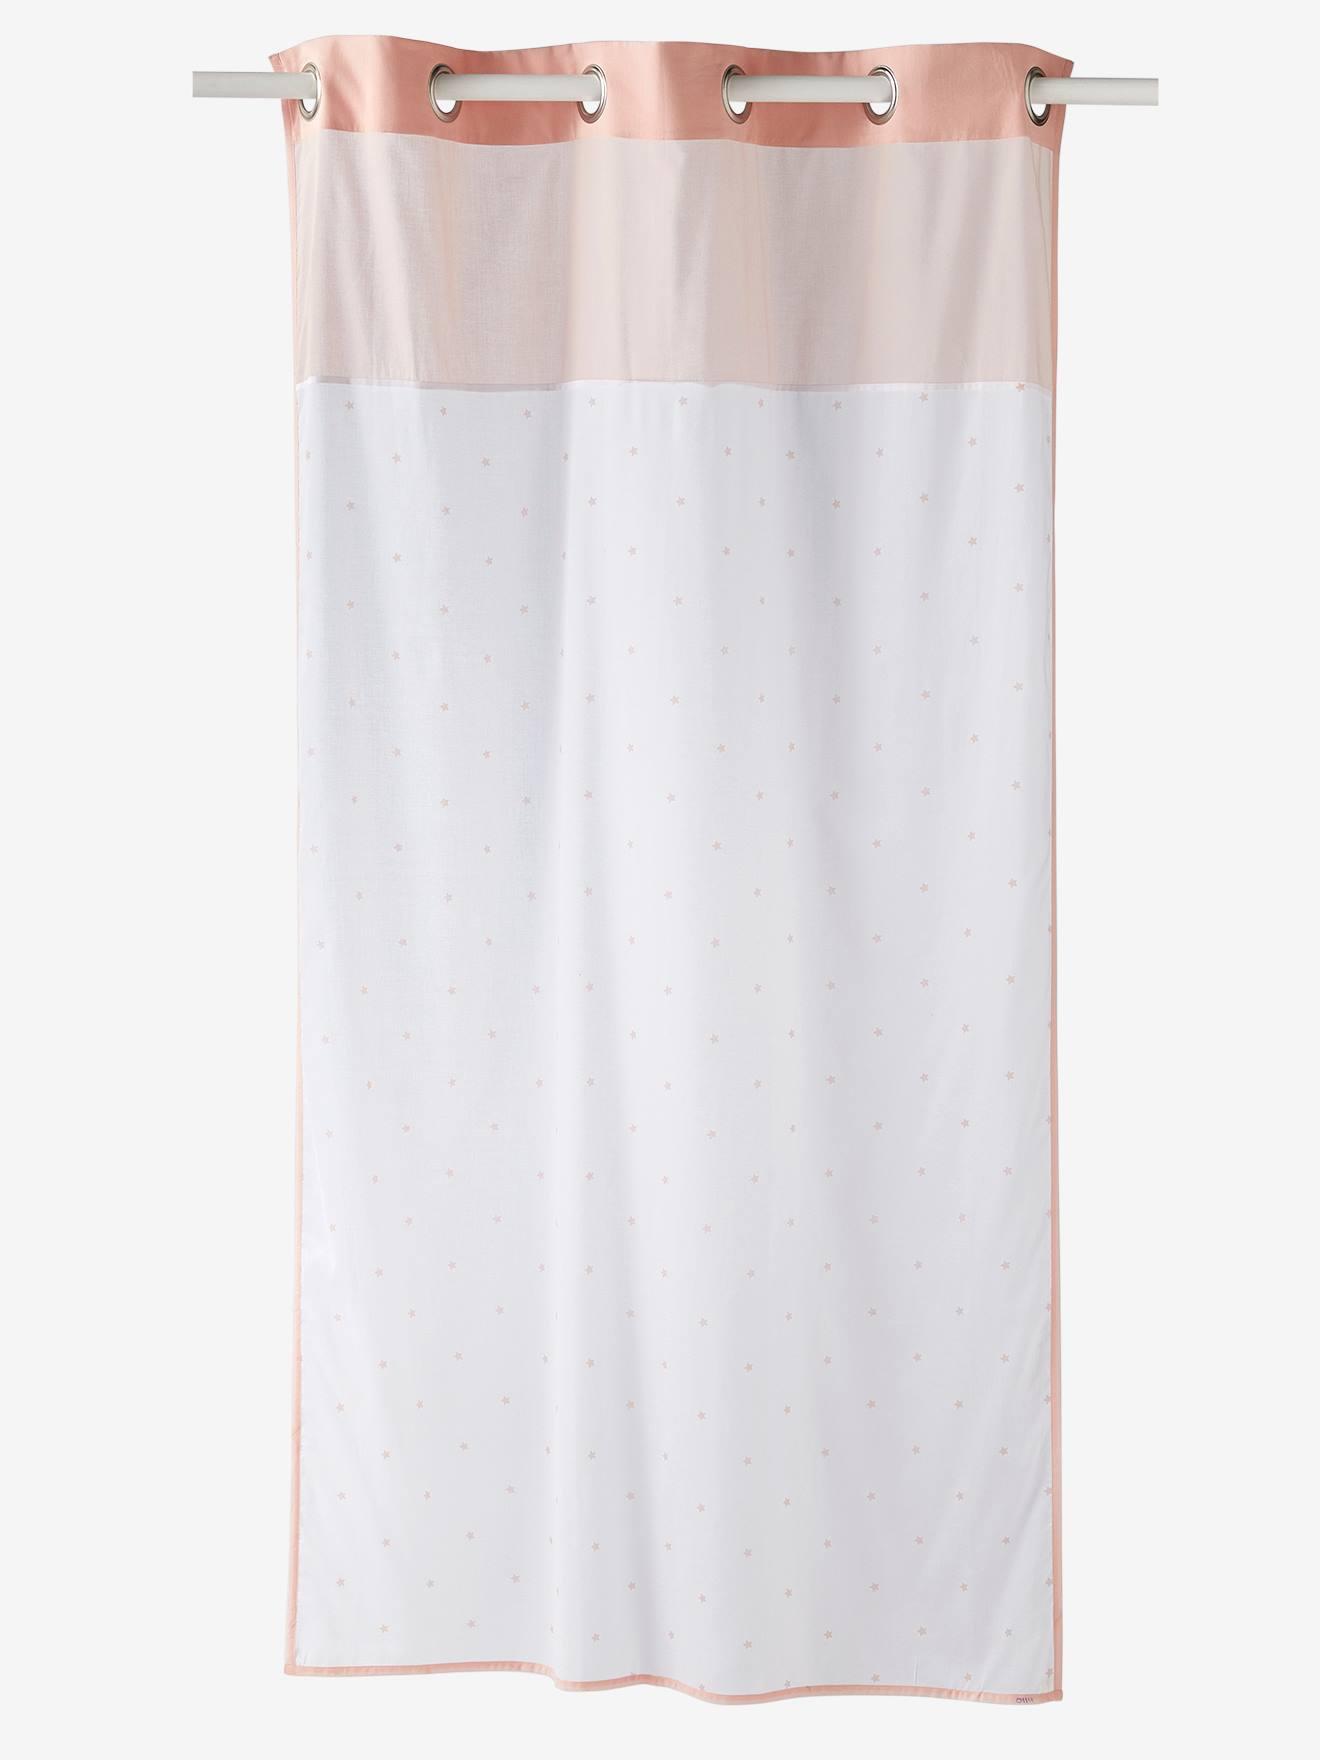 rideau voilage etoiles blanc rose